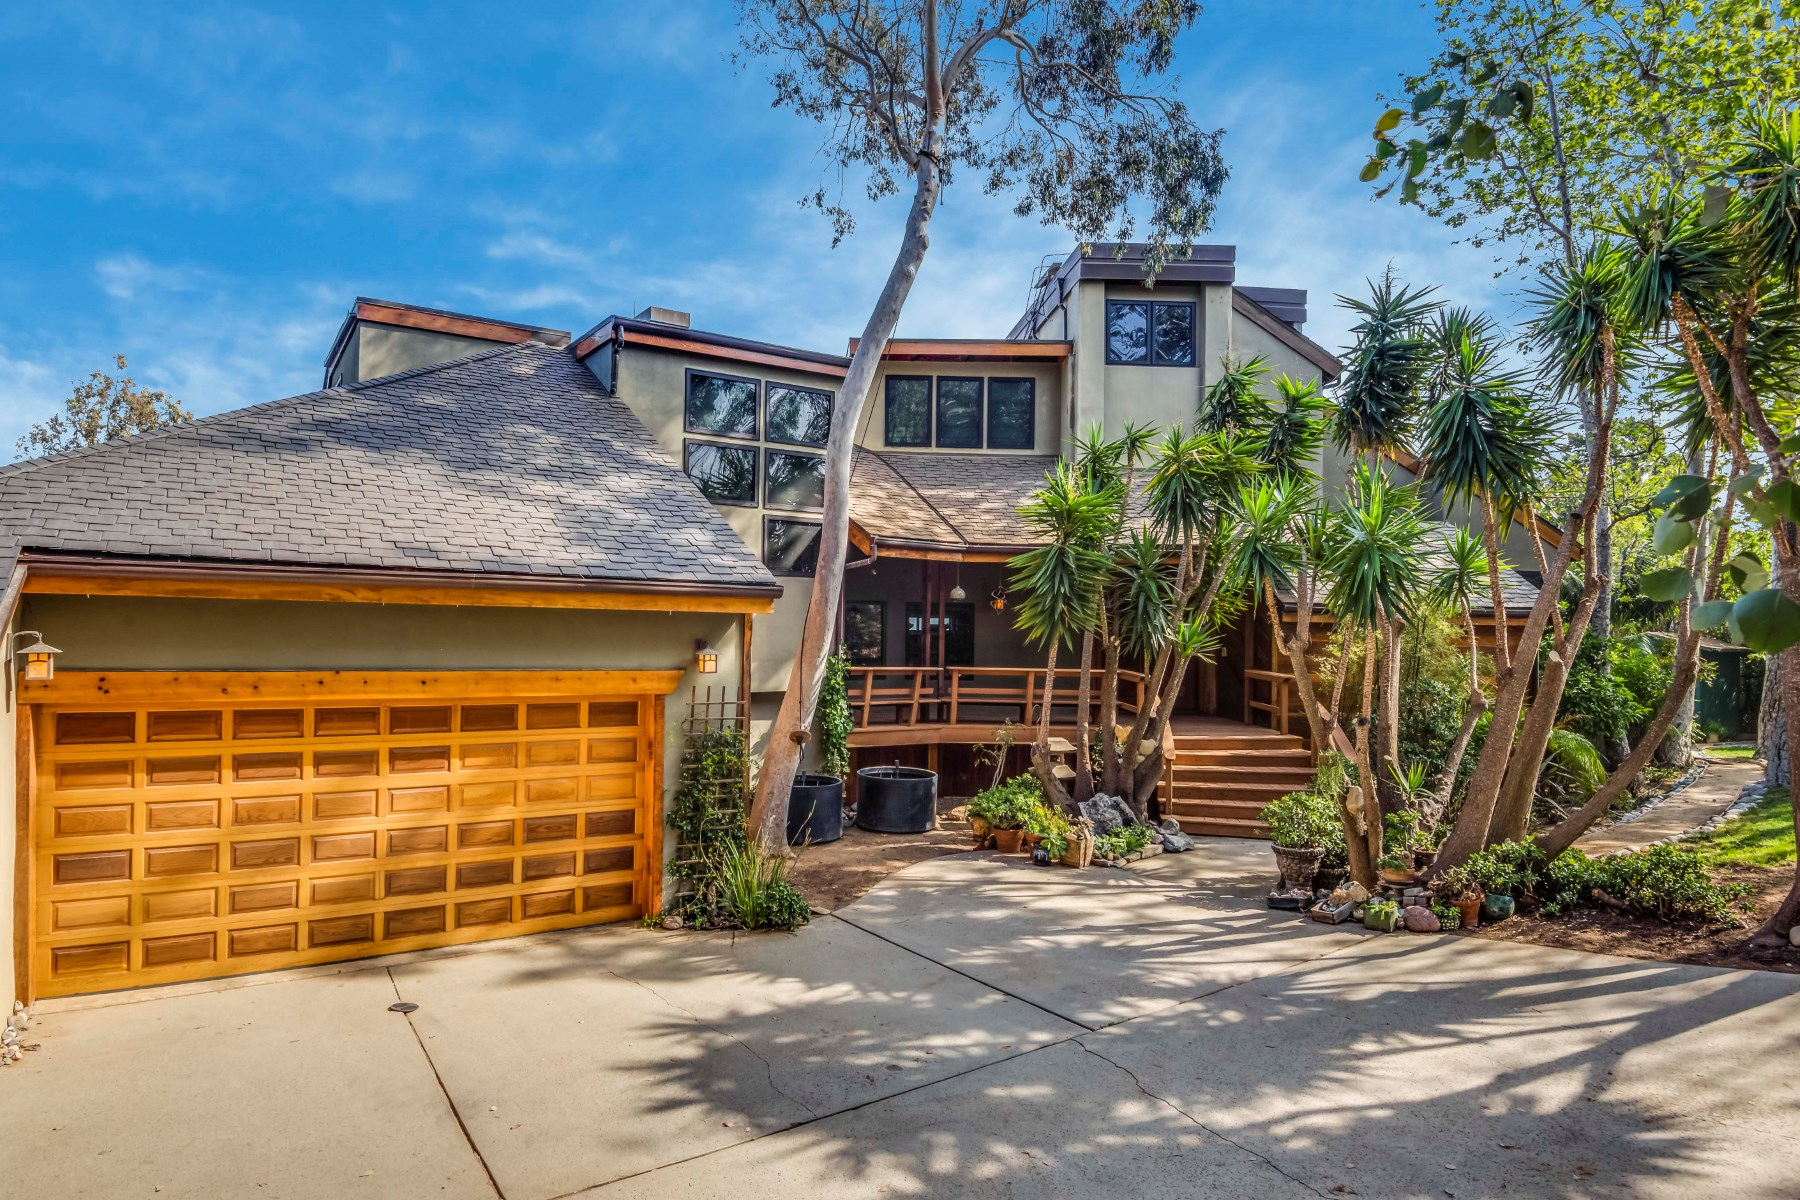 Single Family Home for Sale at Post and beam Craftsman 4756 Latigo Canyon Rd Malibu, California 90265 United States